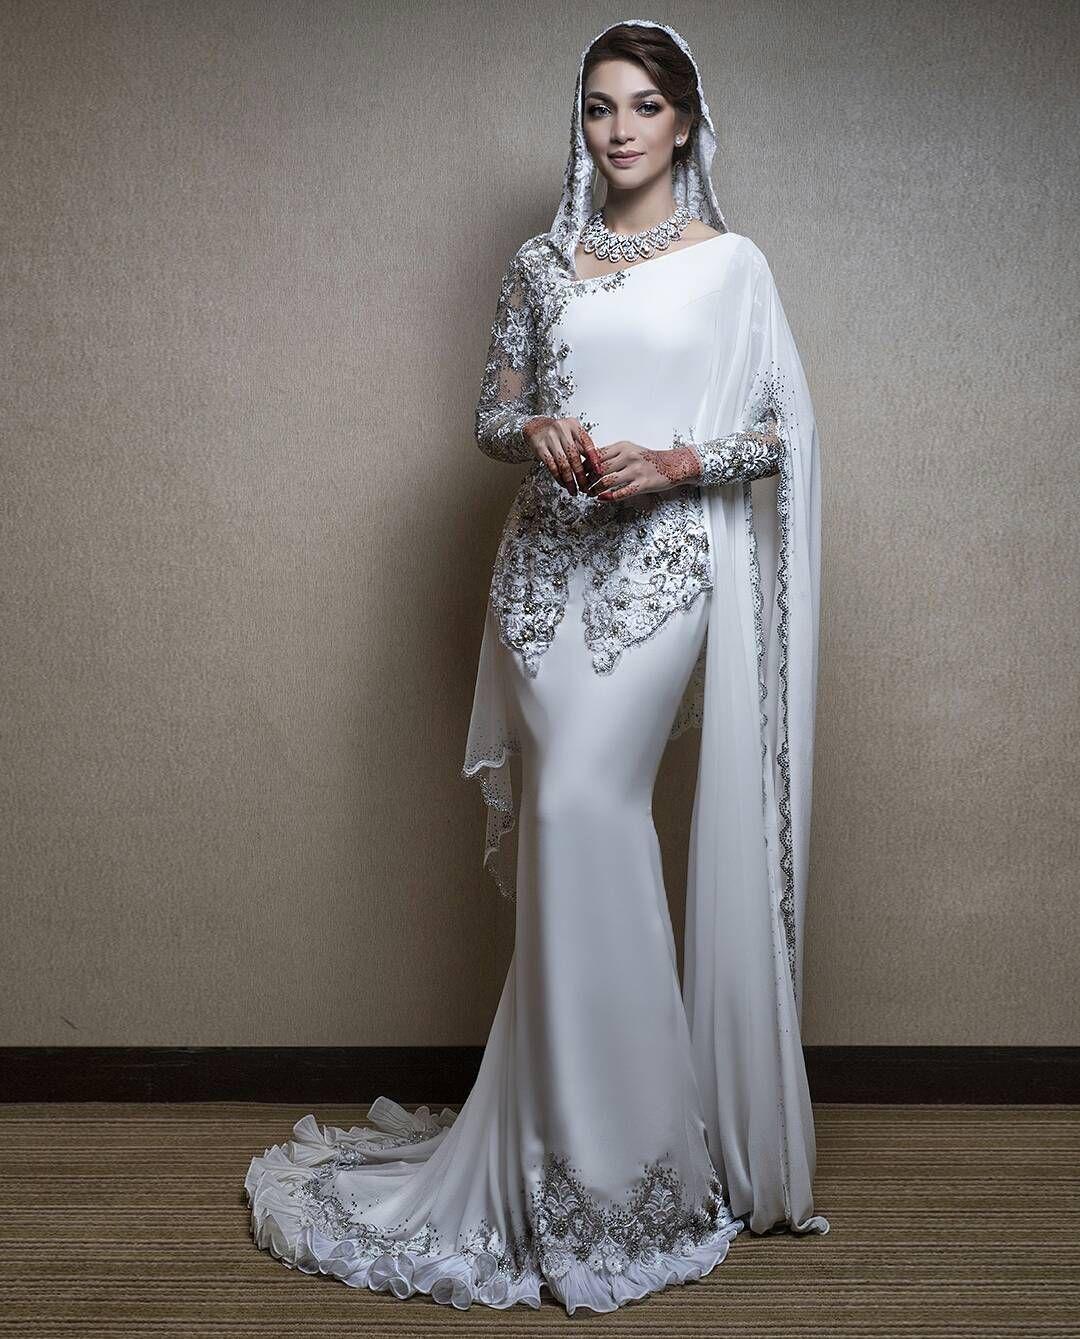 Amyra Rosli Wearing A Custom Kebaya Inspired Dress Rizmanruzaini